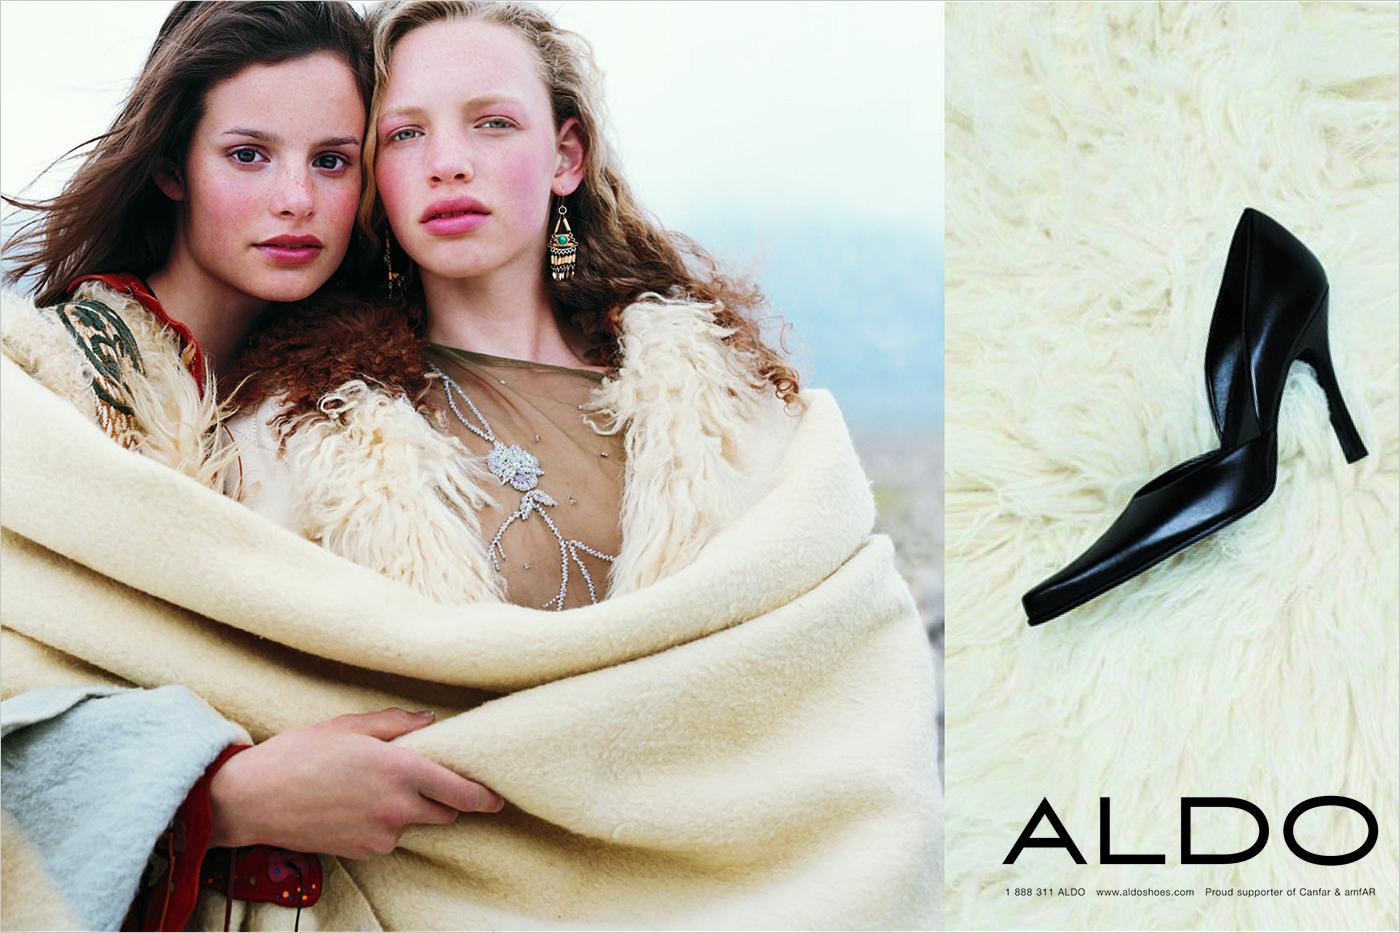 ALDO-FALL02-02-3000x2000.jpg